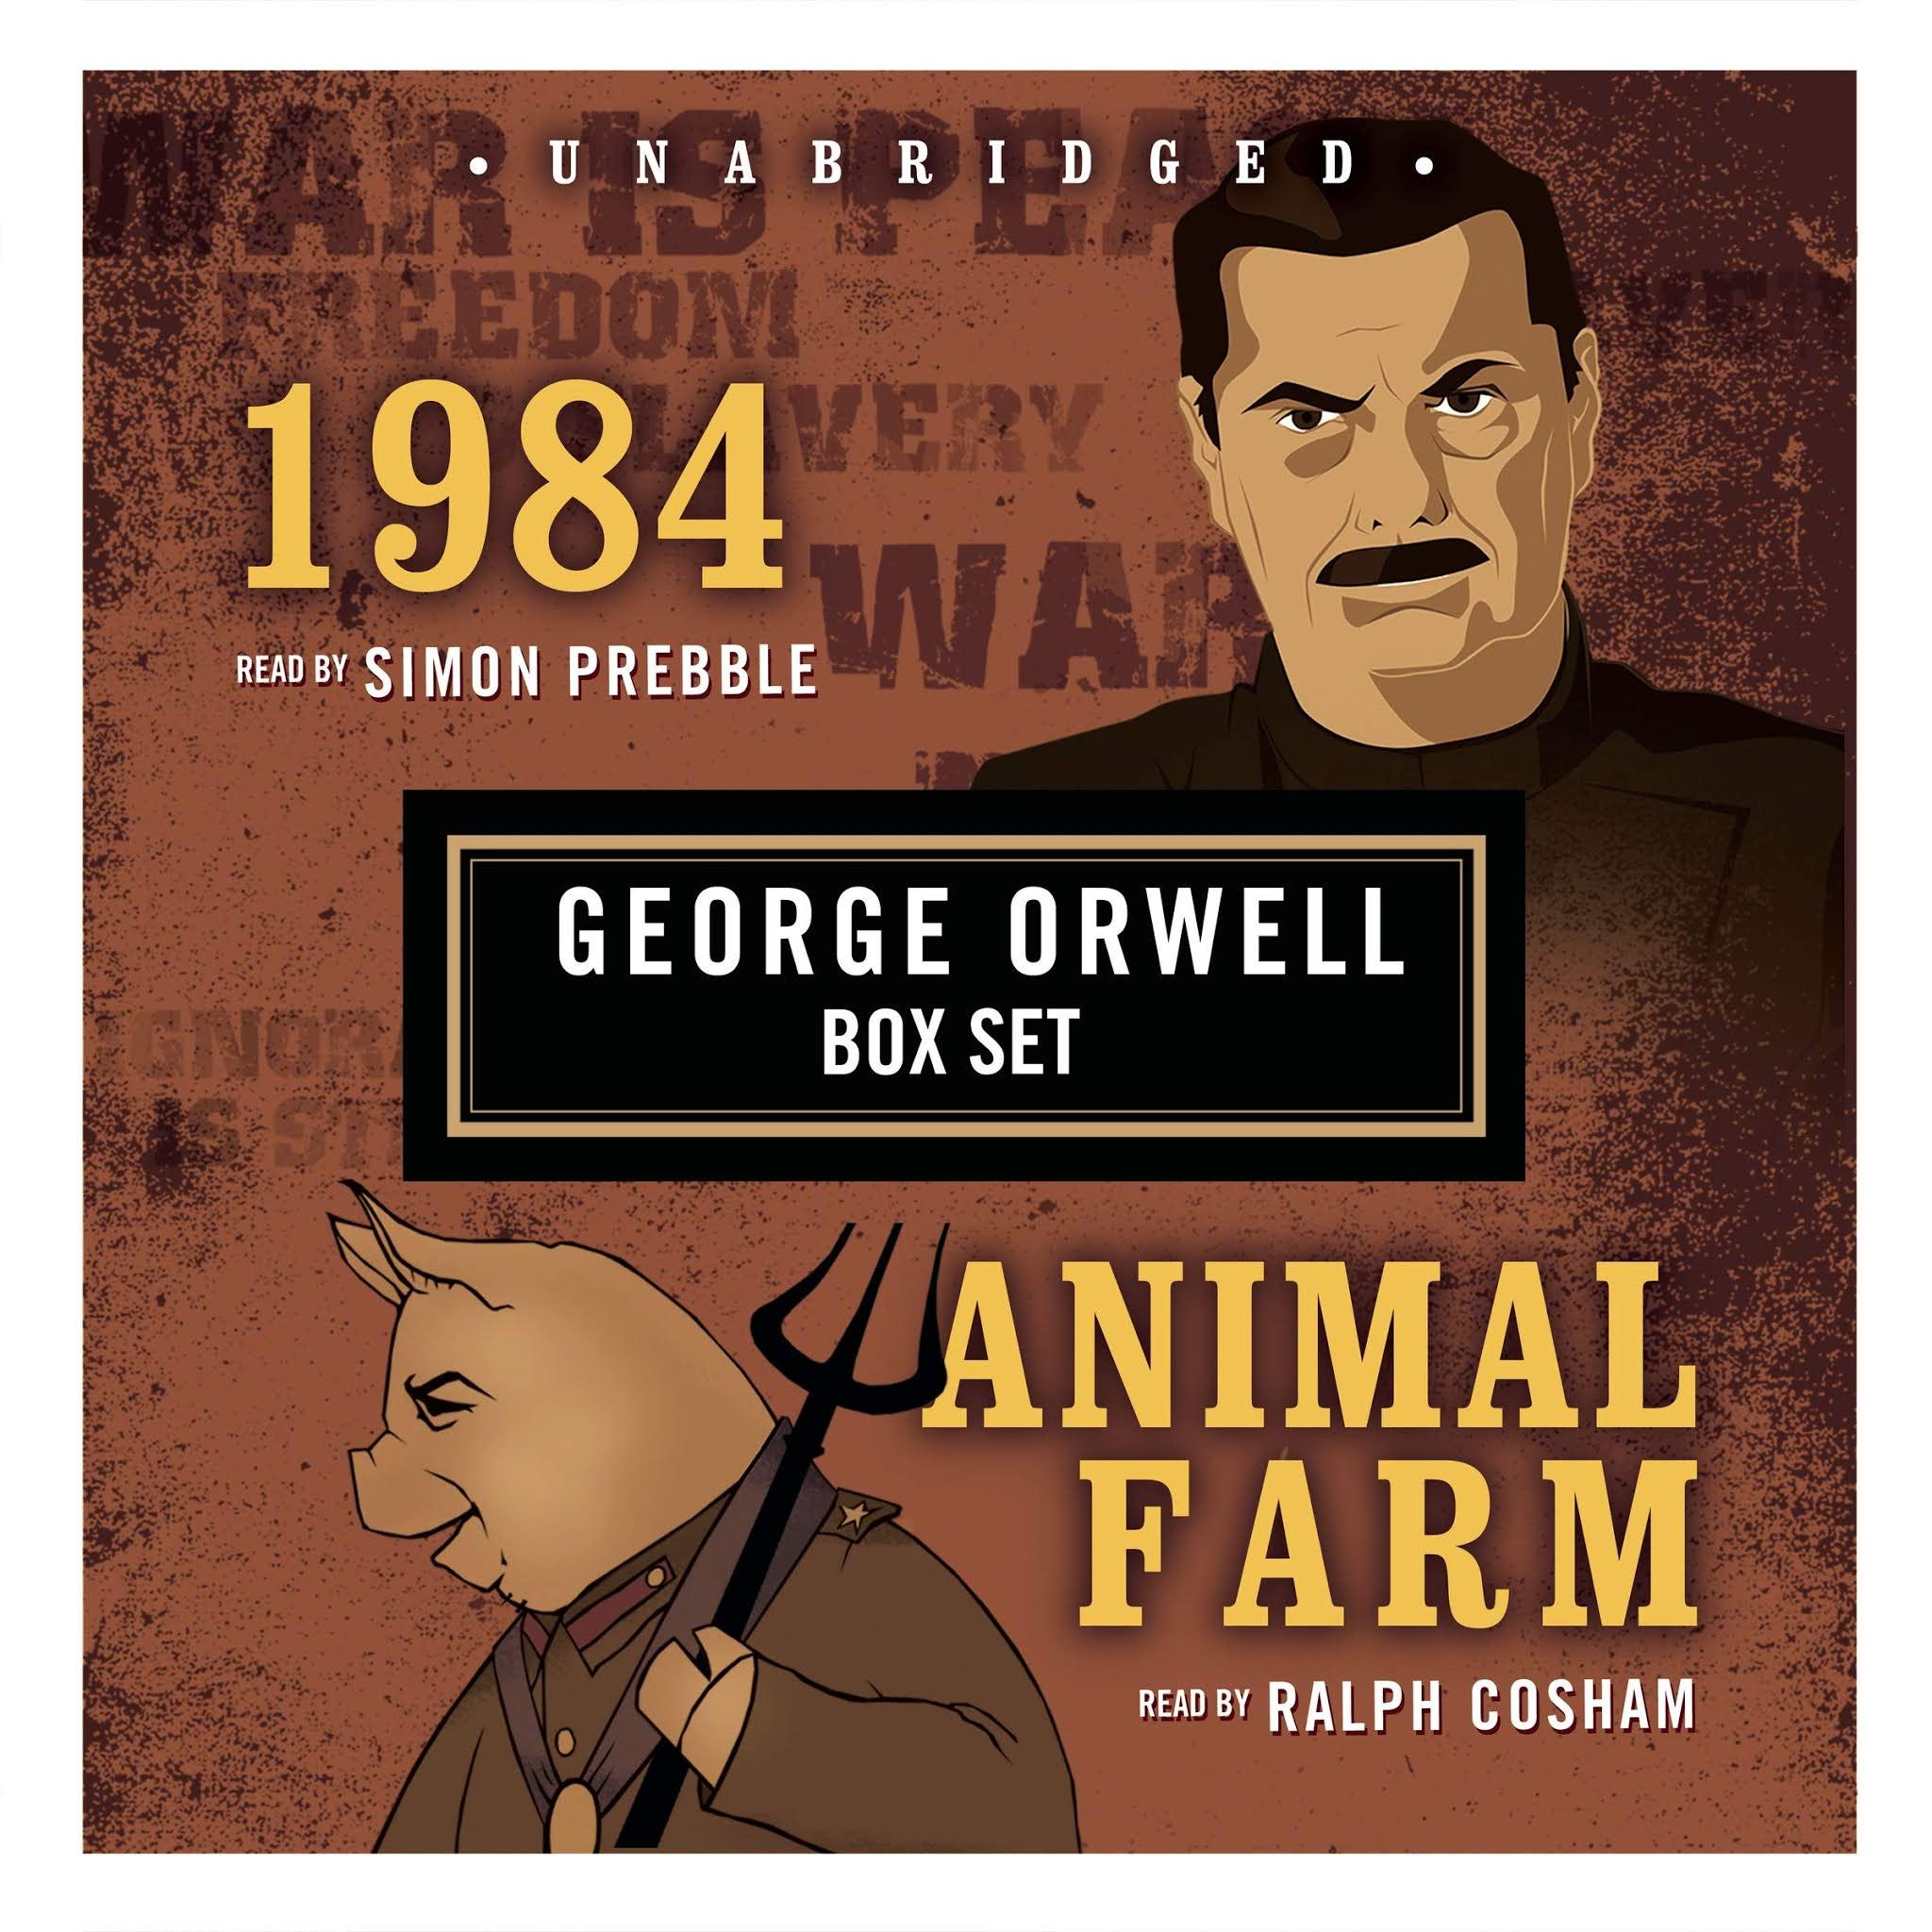 Laporan Buku 1984 and Animal Farm karya George Orwell